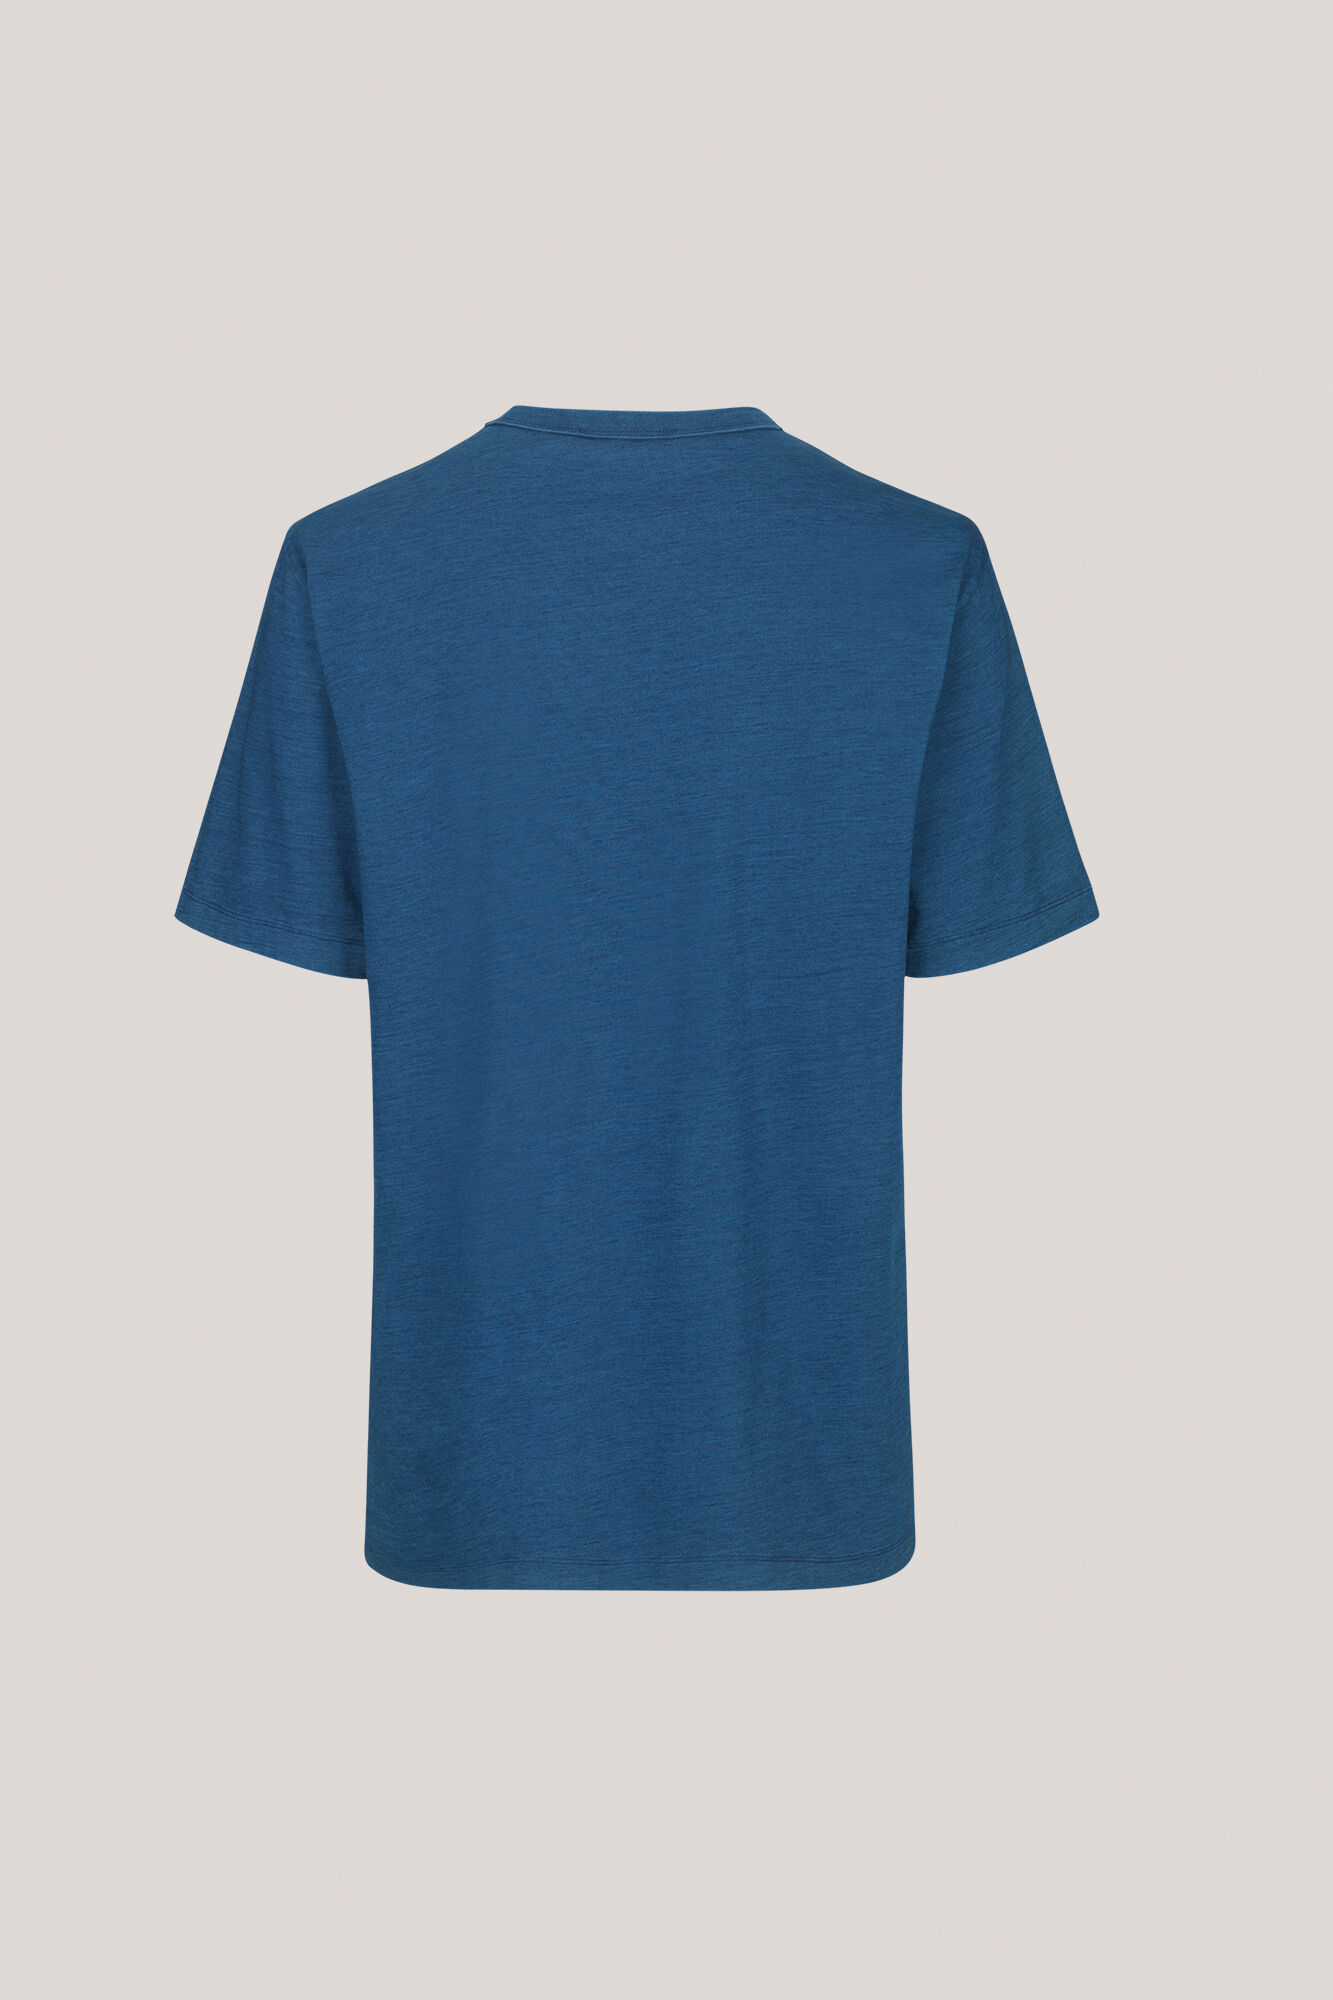 Brabrand t-shirt 10967